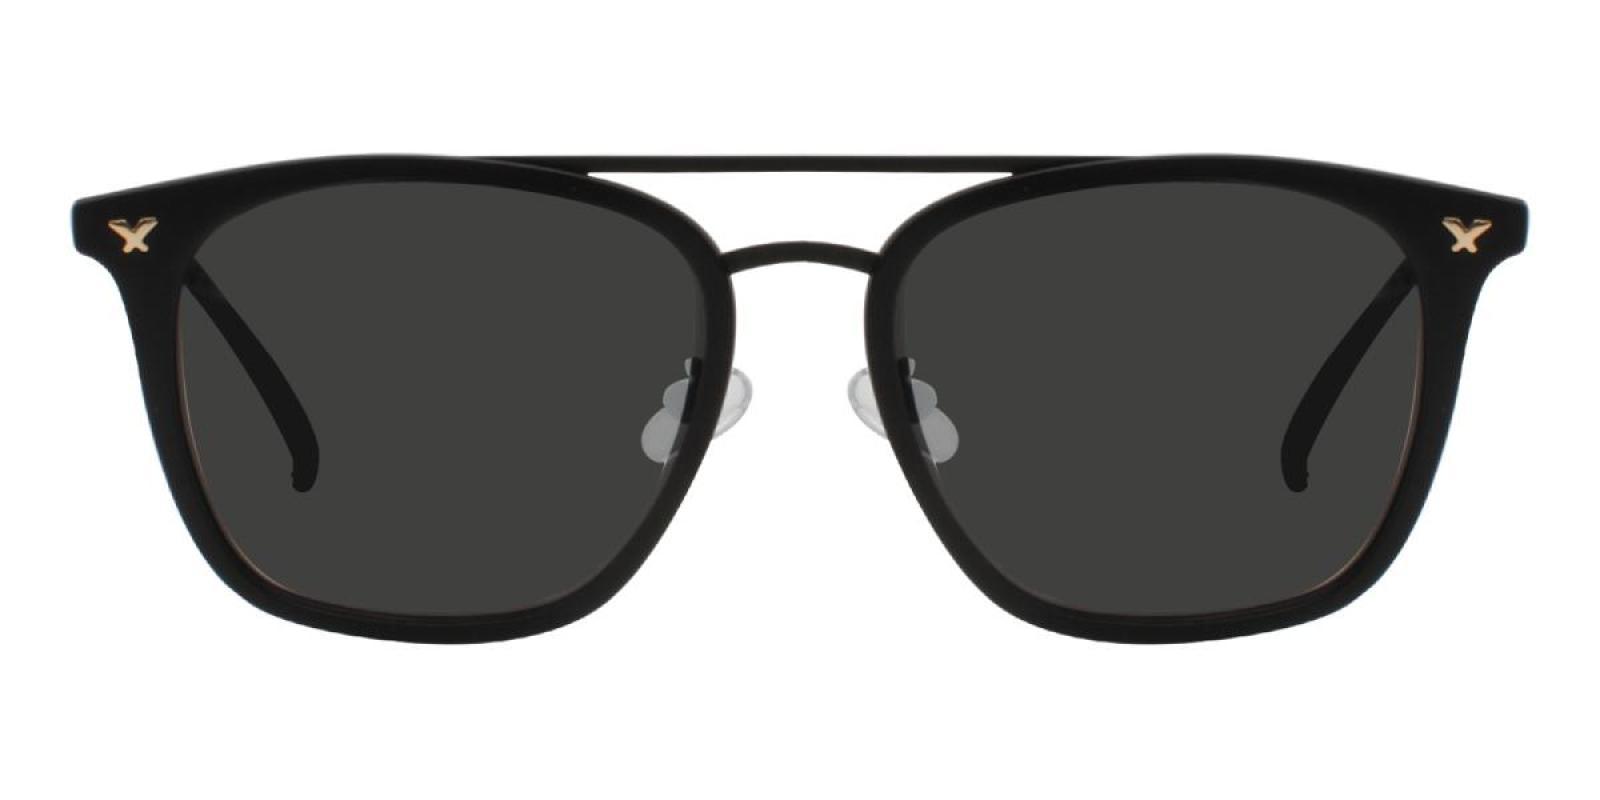 Seagual-Black-Aviator-Combination / Metal / TR-Sunglasses-additional2